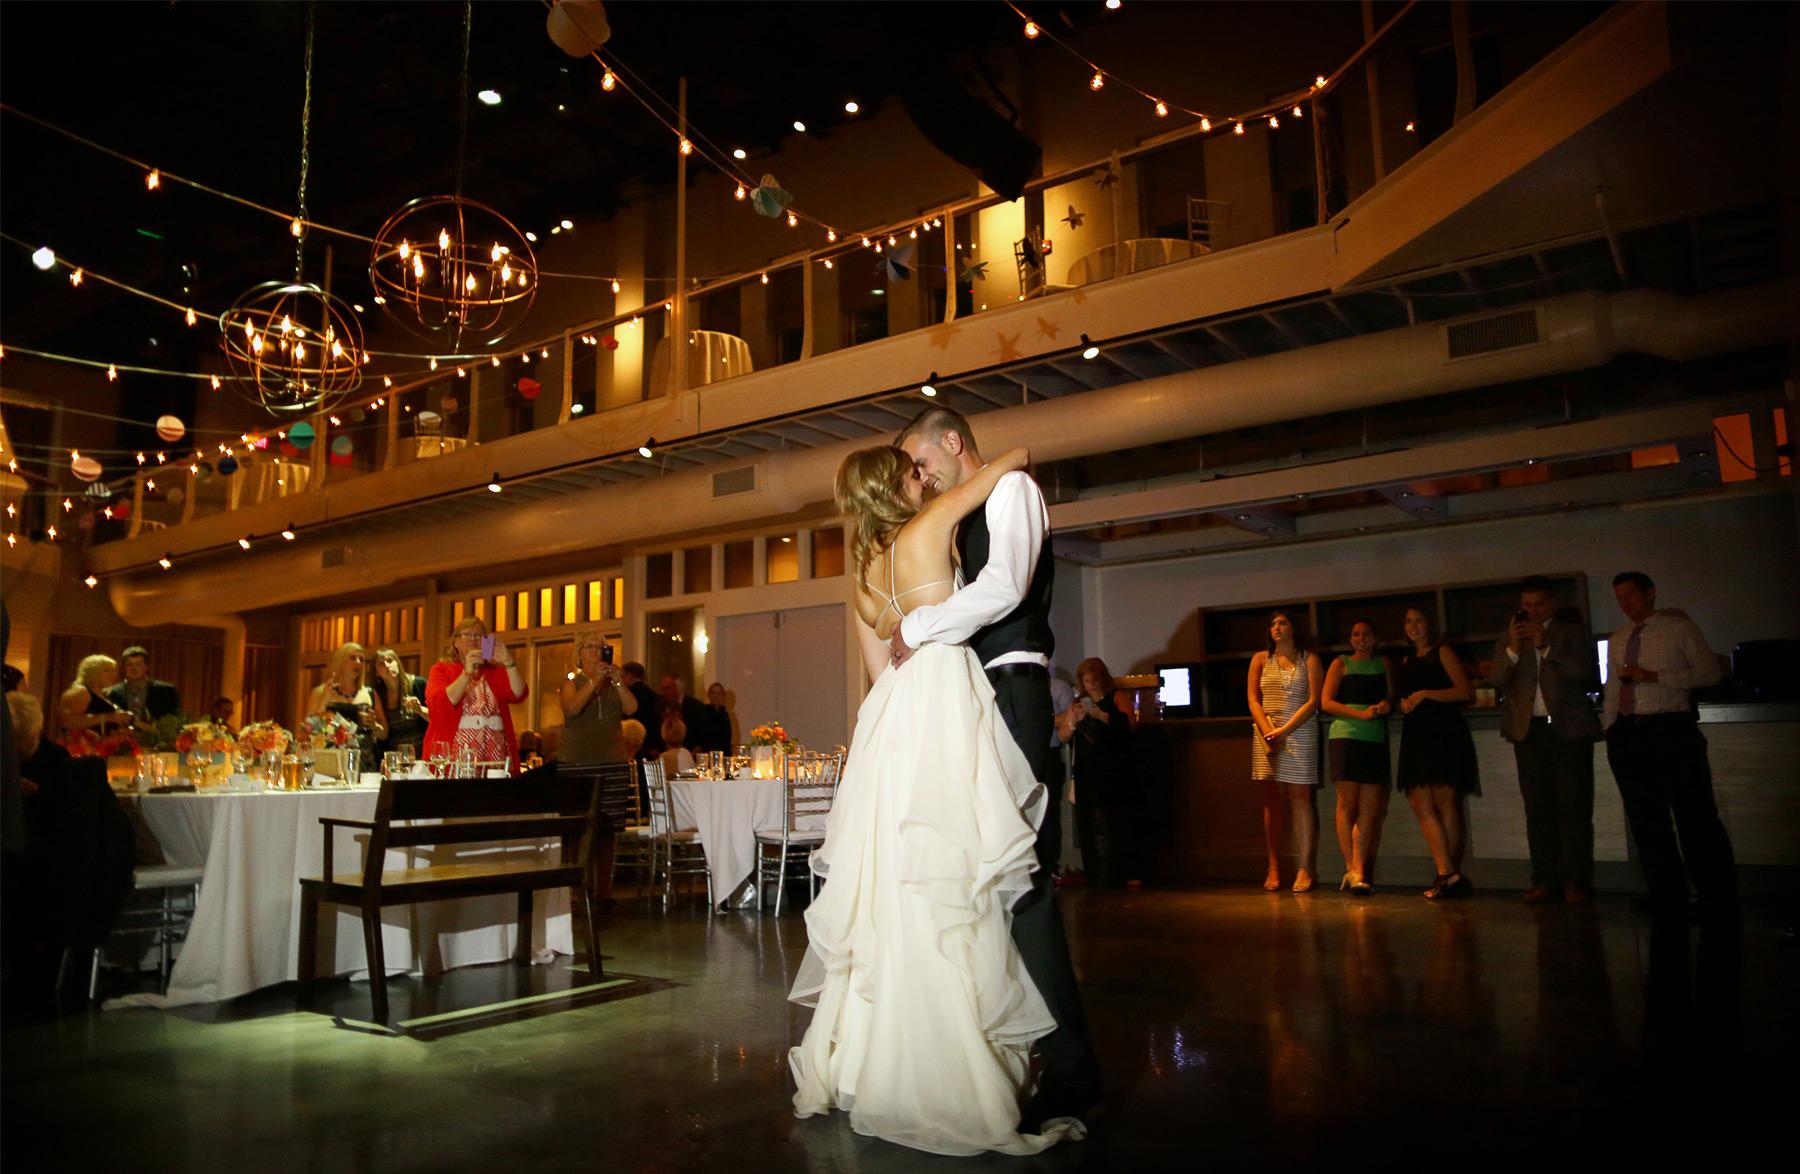 18-Minneapolis-Minnesota-Wedding-Photography-by-Vick-Photography-Muse-Event-Center-Reception-First-Dance-Jess-&-Jake.jpg